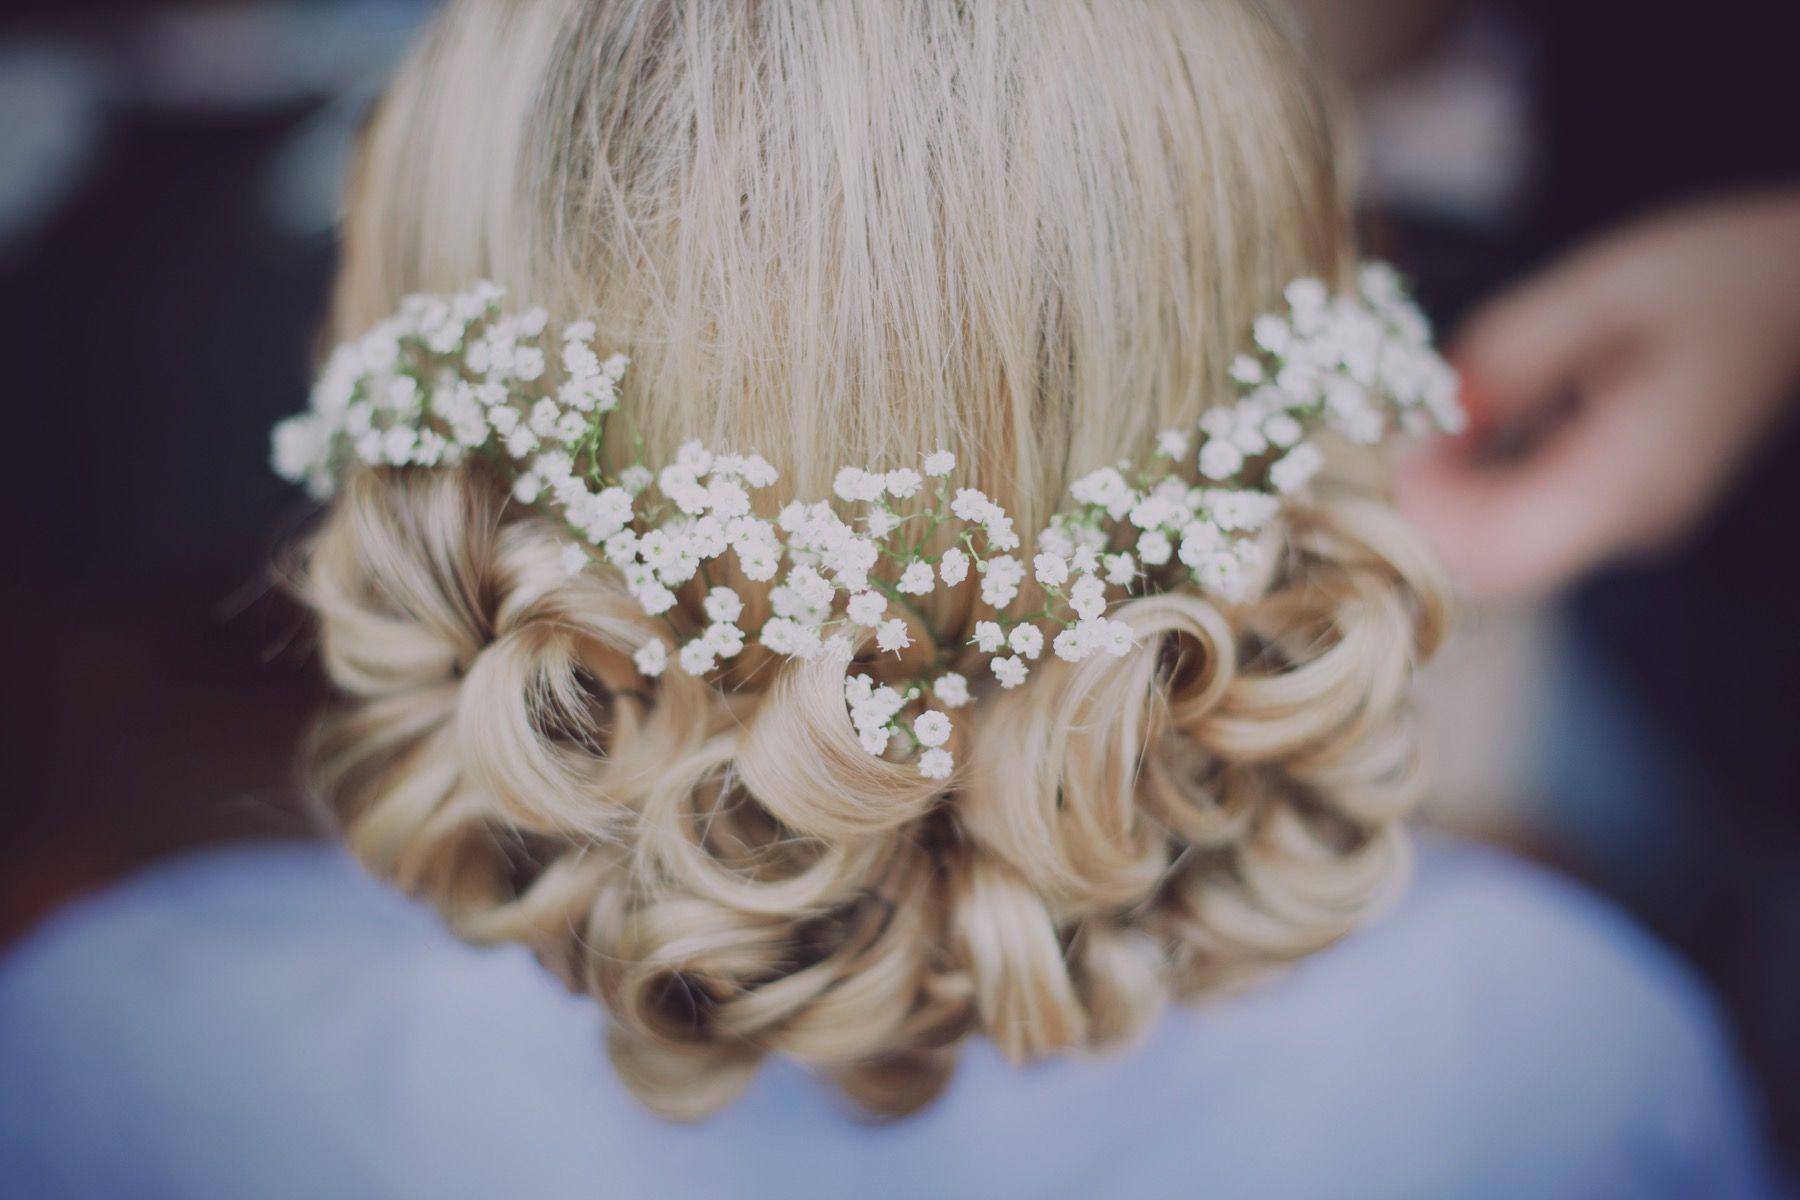 Coiffure jolie Chignon fleurs, photographe de mariage en dordogne - Ulrike Photographe